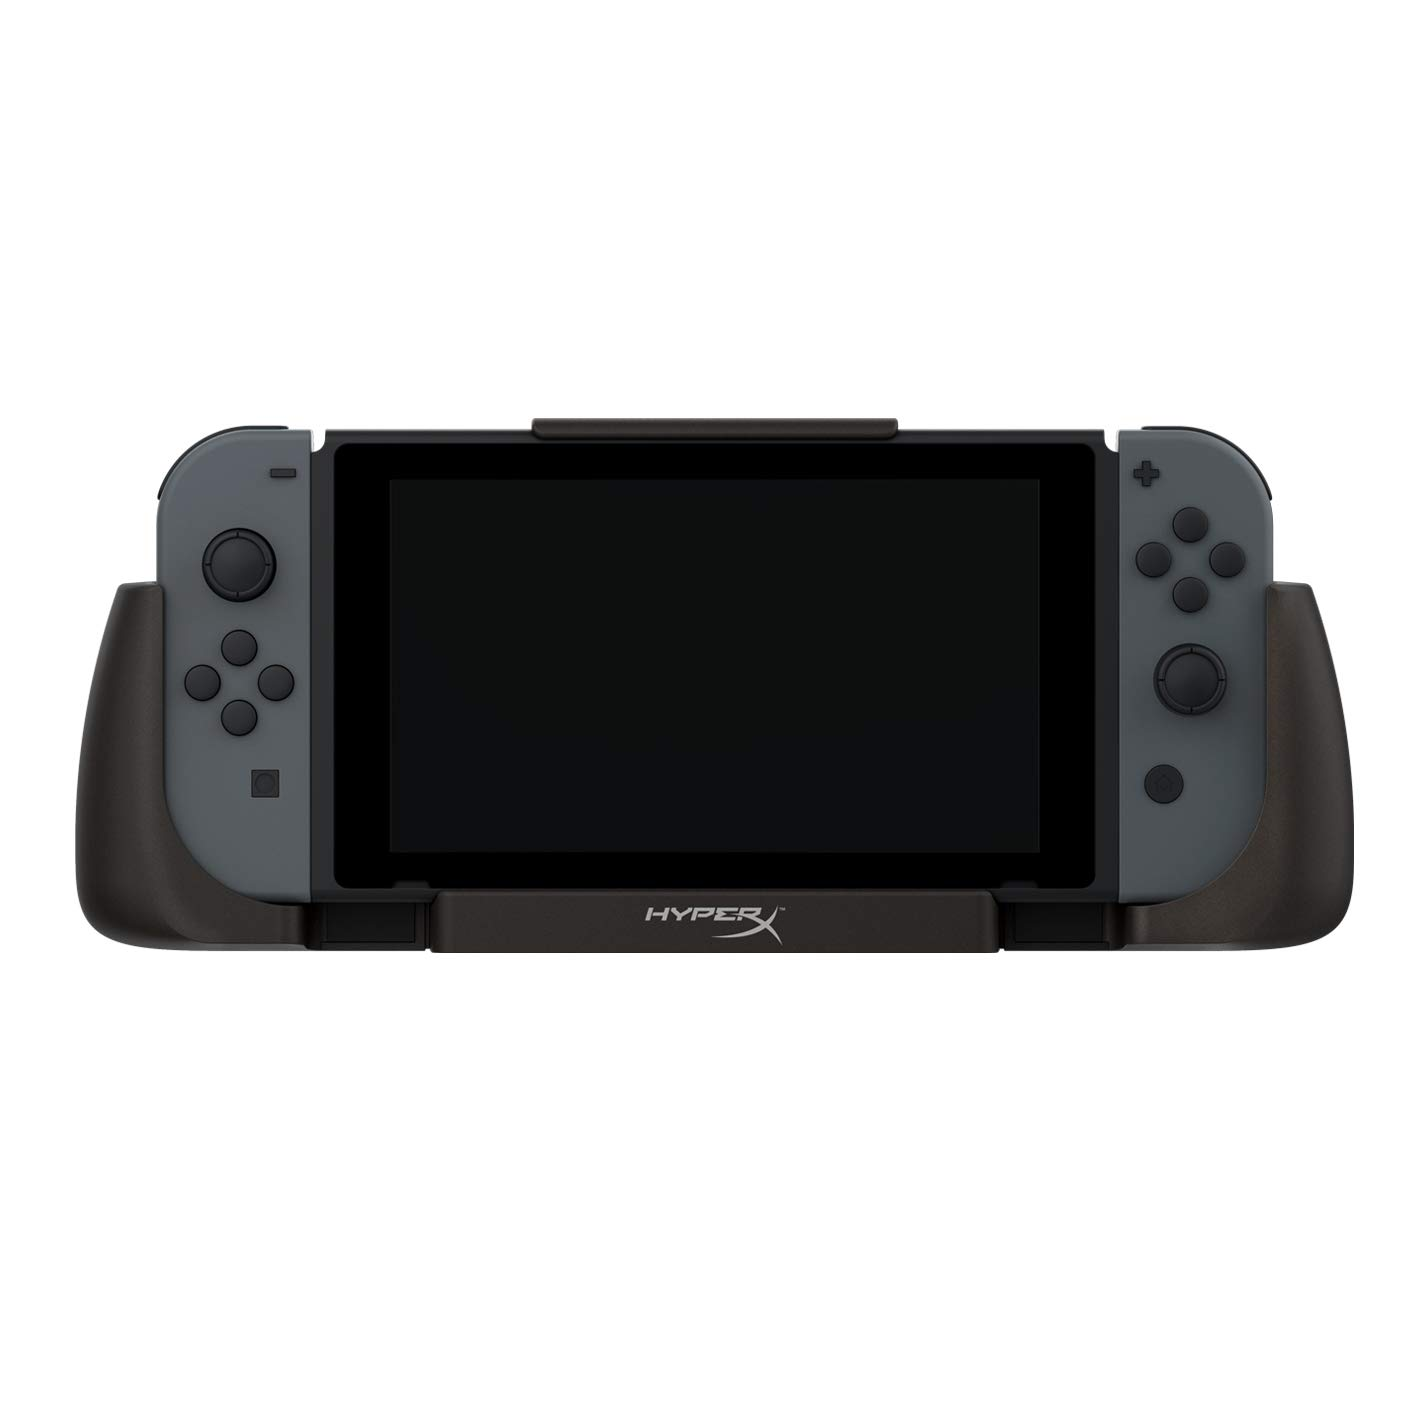 Accesorios para Consolas > Para Nintendo > <b>Fuentes de Alimentación</b>